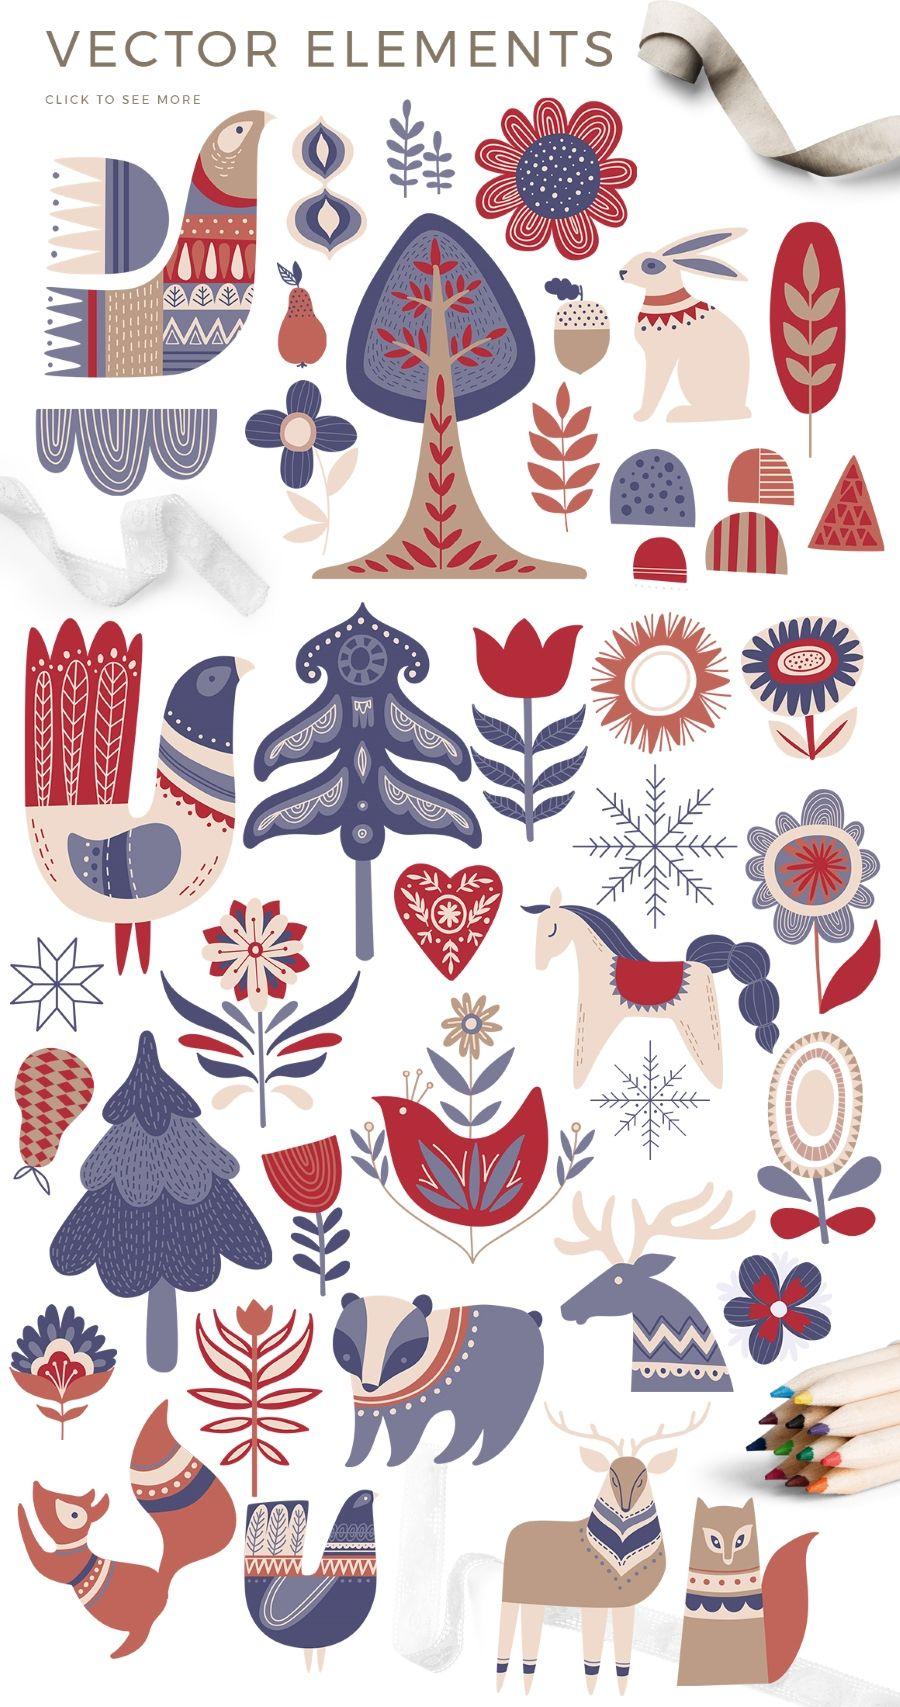 Scandinavian Winter Bundle 80 Vector And Raster Elements 15 Master Bundles Christmas Illustration Christmas Art Scandinavian Folk Art